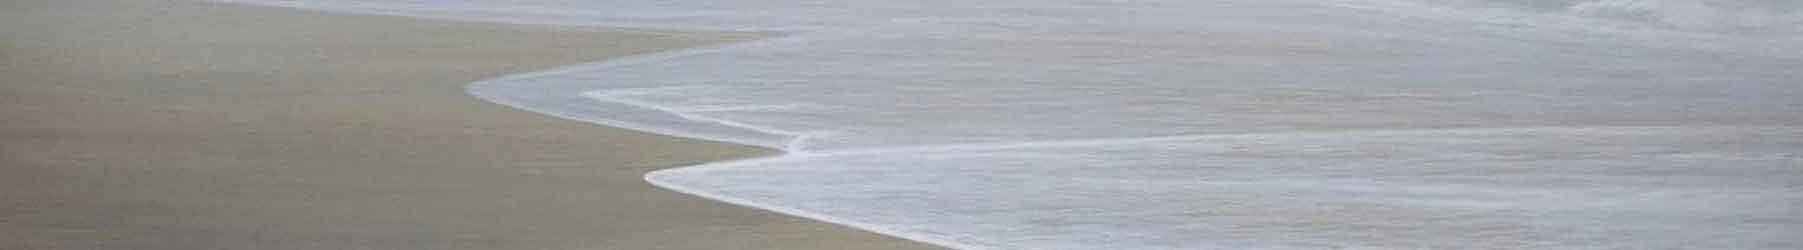 Kennebuunkport Sandy Beaches Maine Seacoast